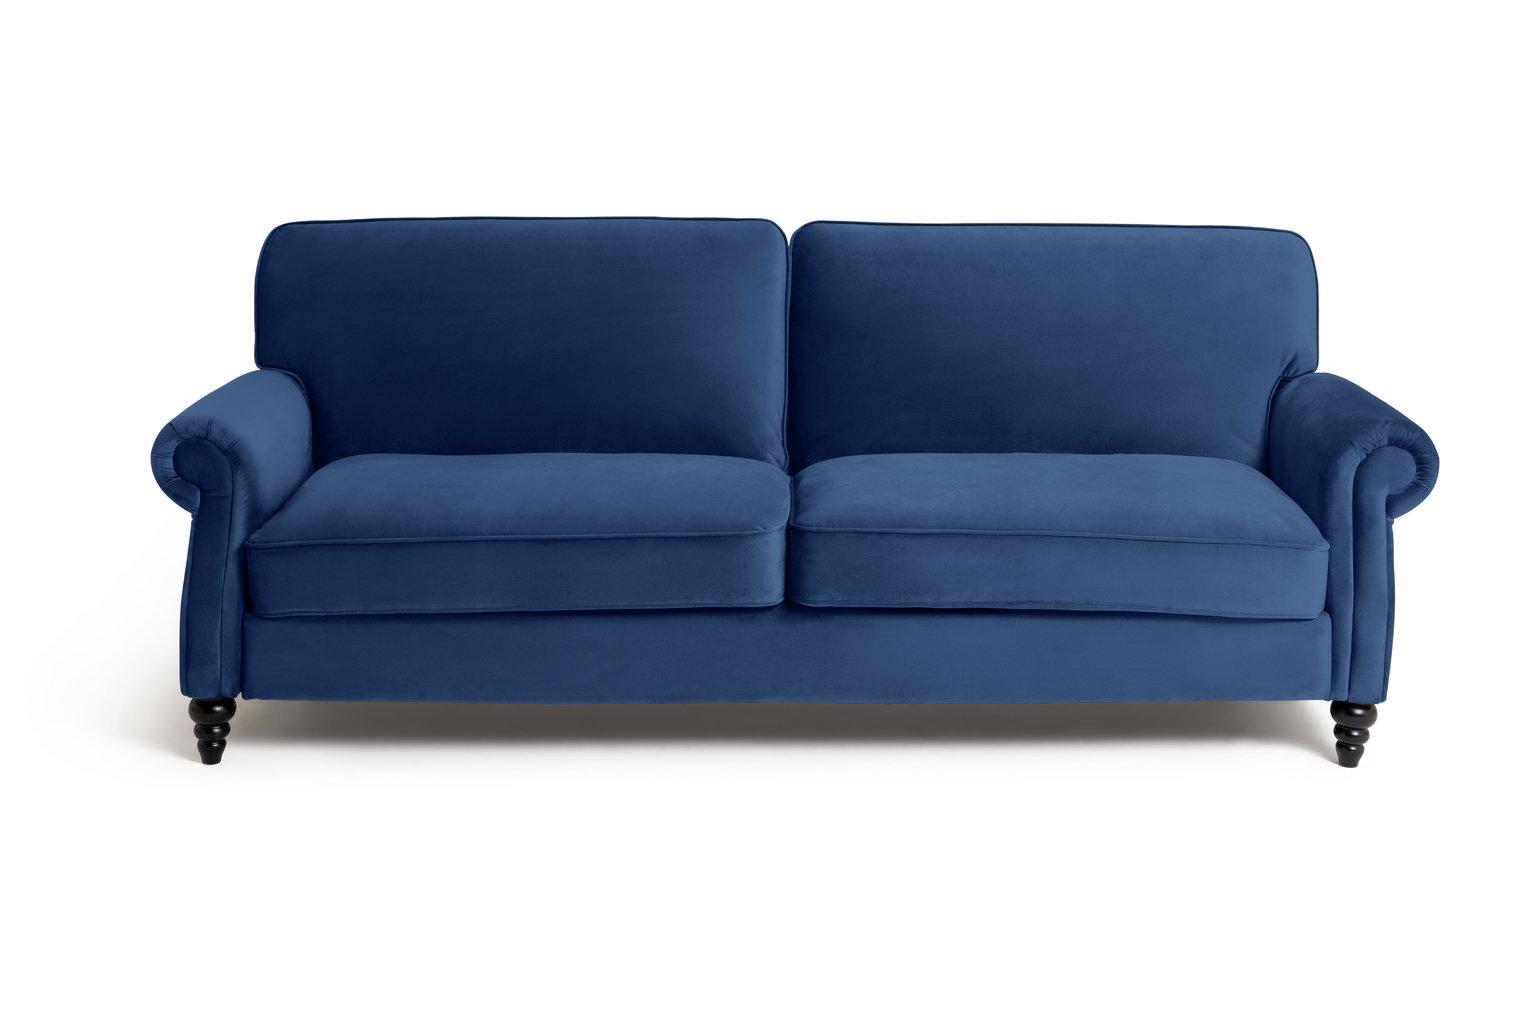 Habitat Joel 3 Seater Fabric Sofa Bed - Navy